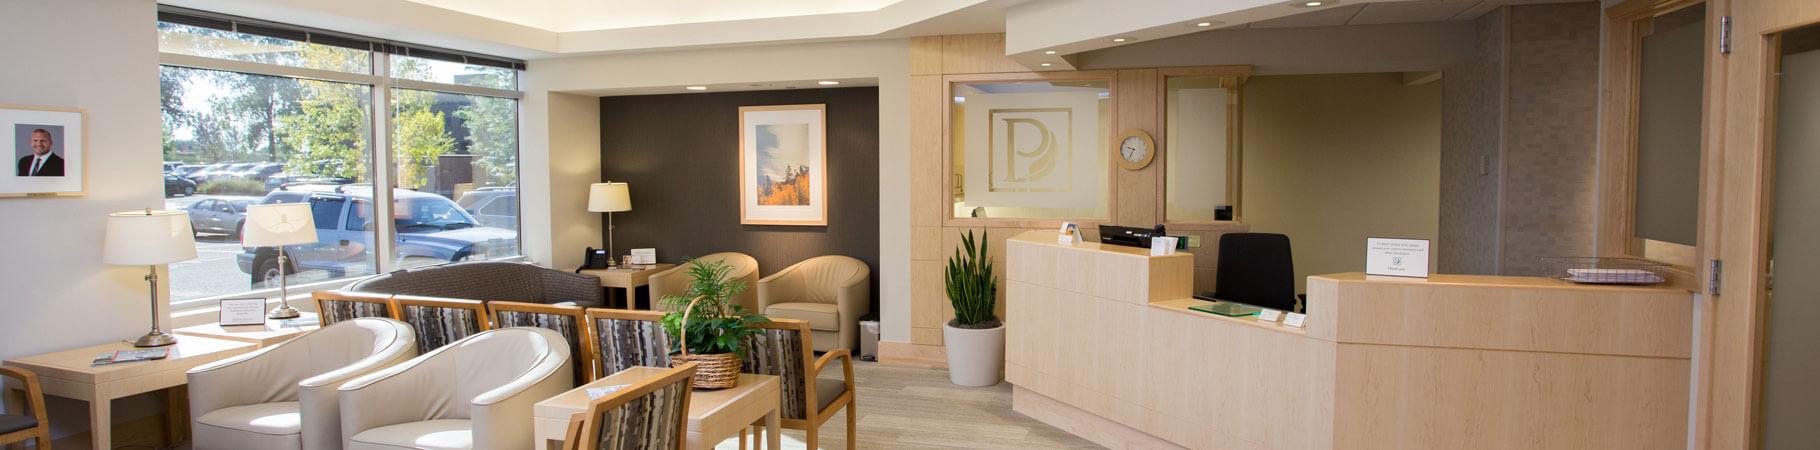 Dentist Coon Rapids, MN - Park Dental Coon Rapids   Dentist ...